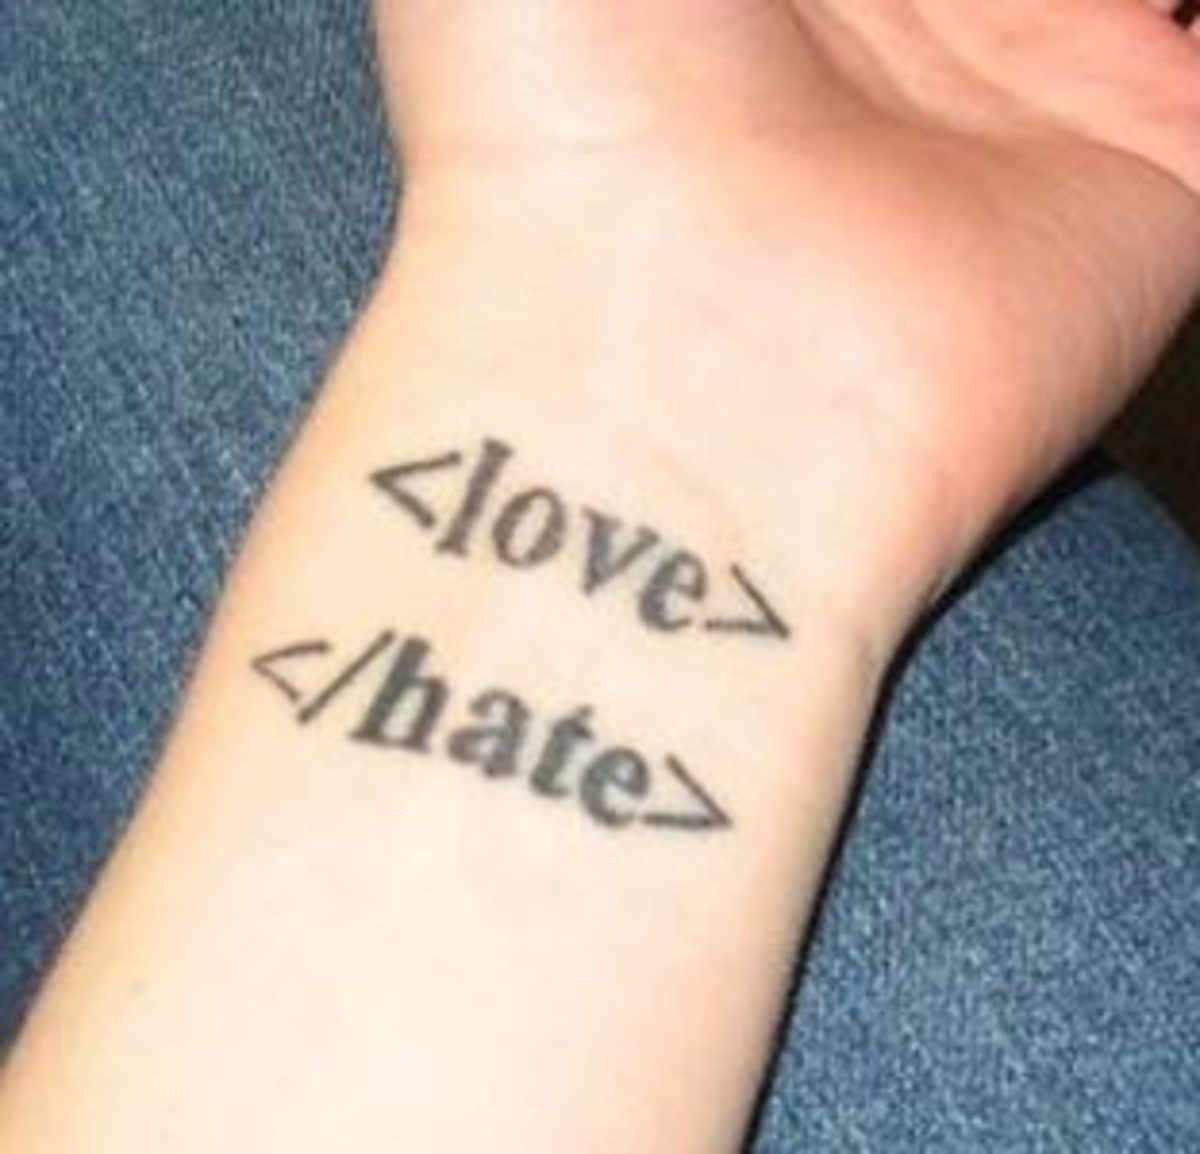 idei-dlya-tatuirovok - Выродка татуировки картинки -  - фото